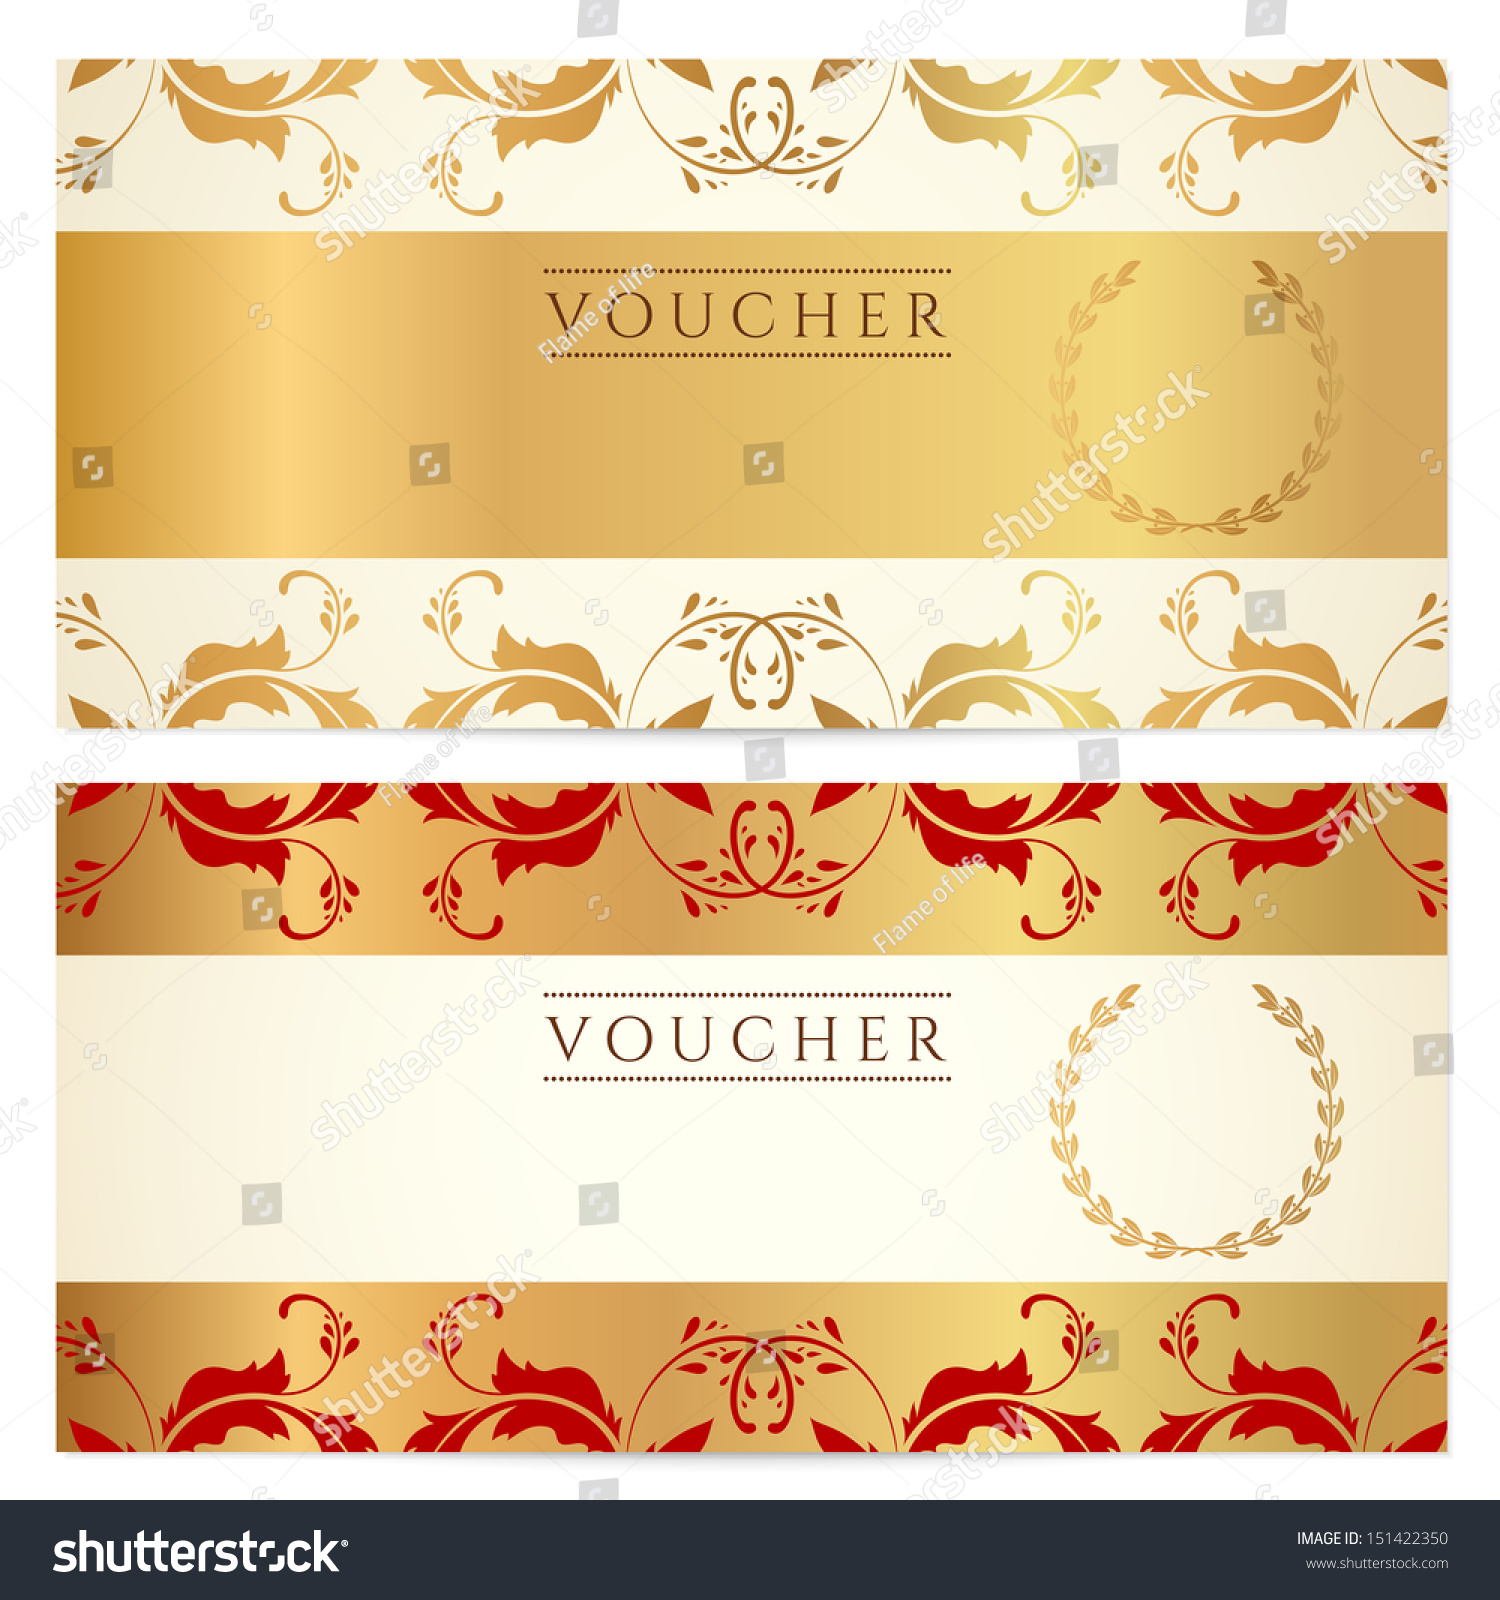 coupon voucher template – Voucher Sample Design